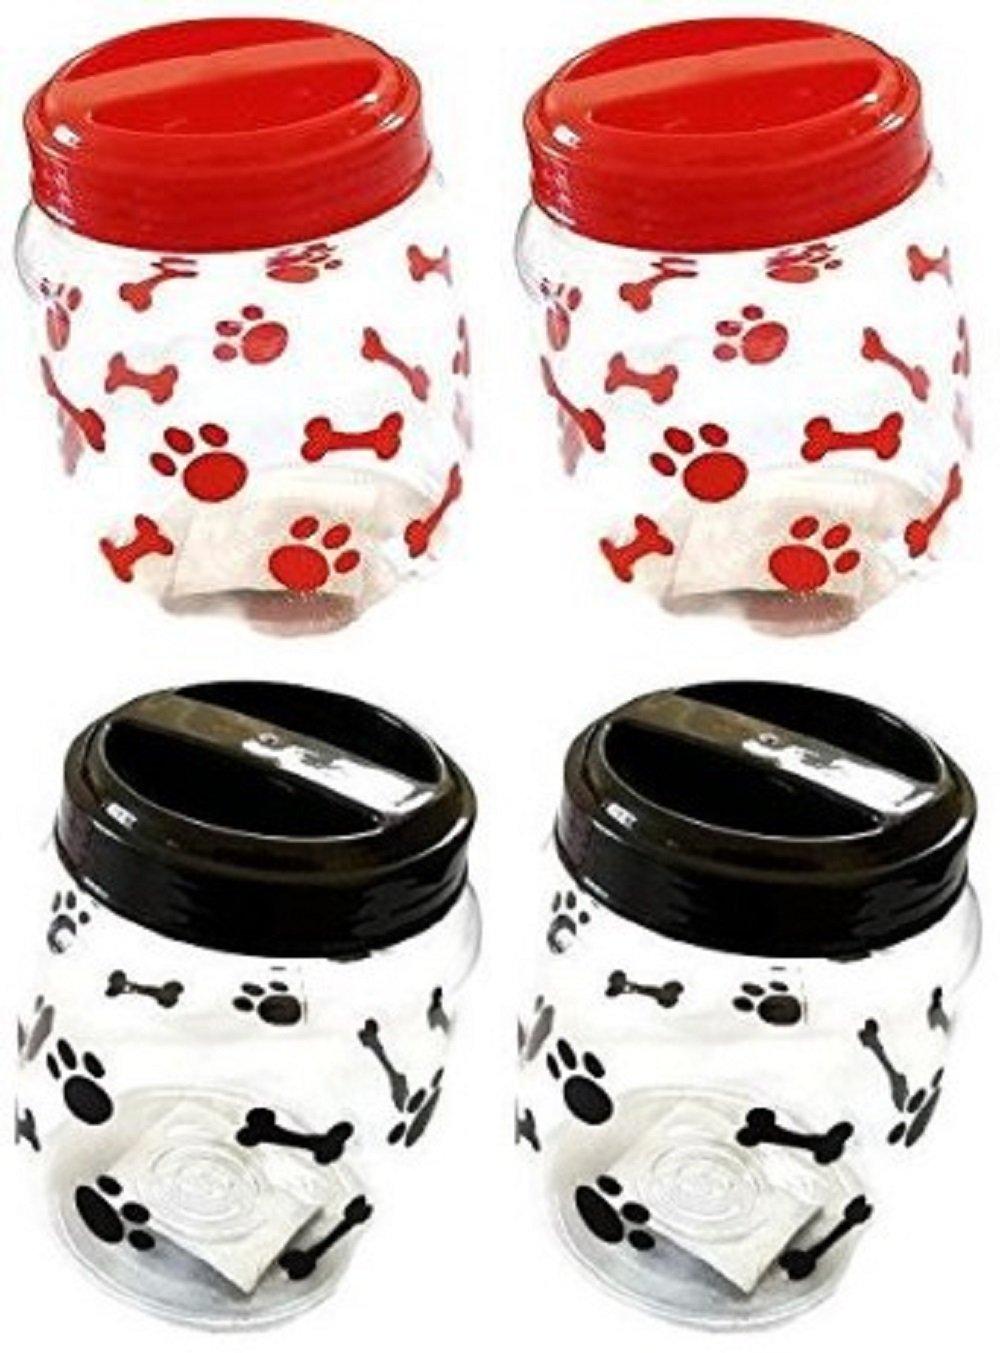 Pet Food Treats Plastic Storage Jars, Paws and Bones, Dogs and Cats, 4-jar Set